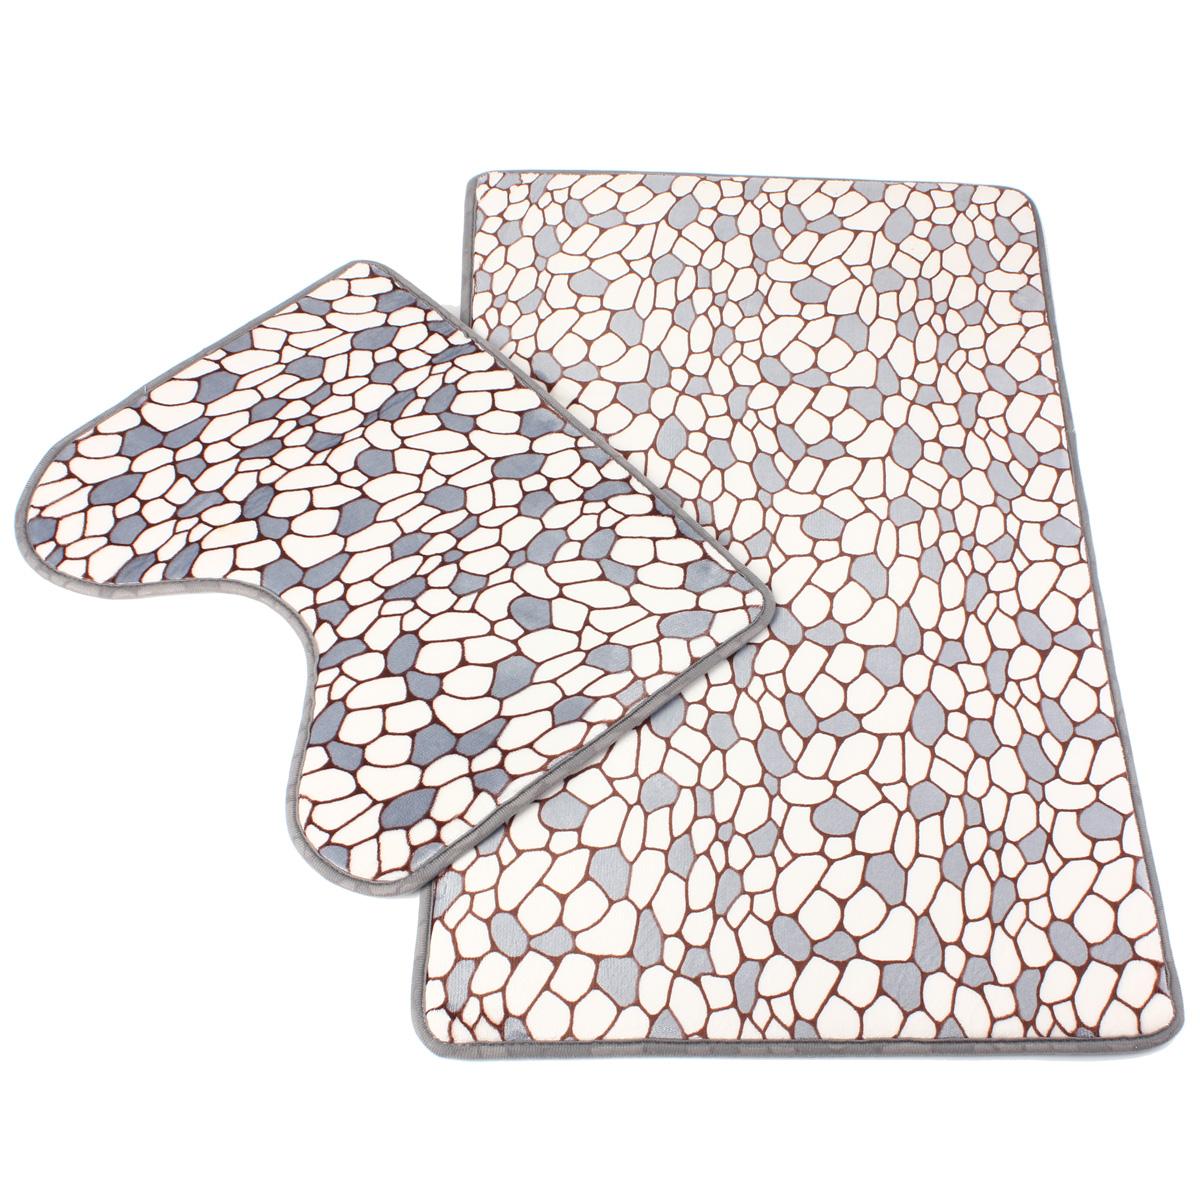 Washable Bathroom Carpet: Bath Mat Sets Carpet Bathroom Toilet Shower Rug Soft